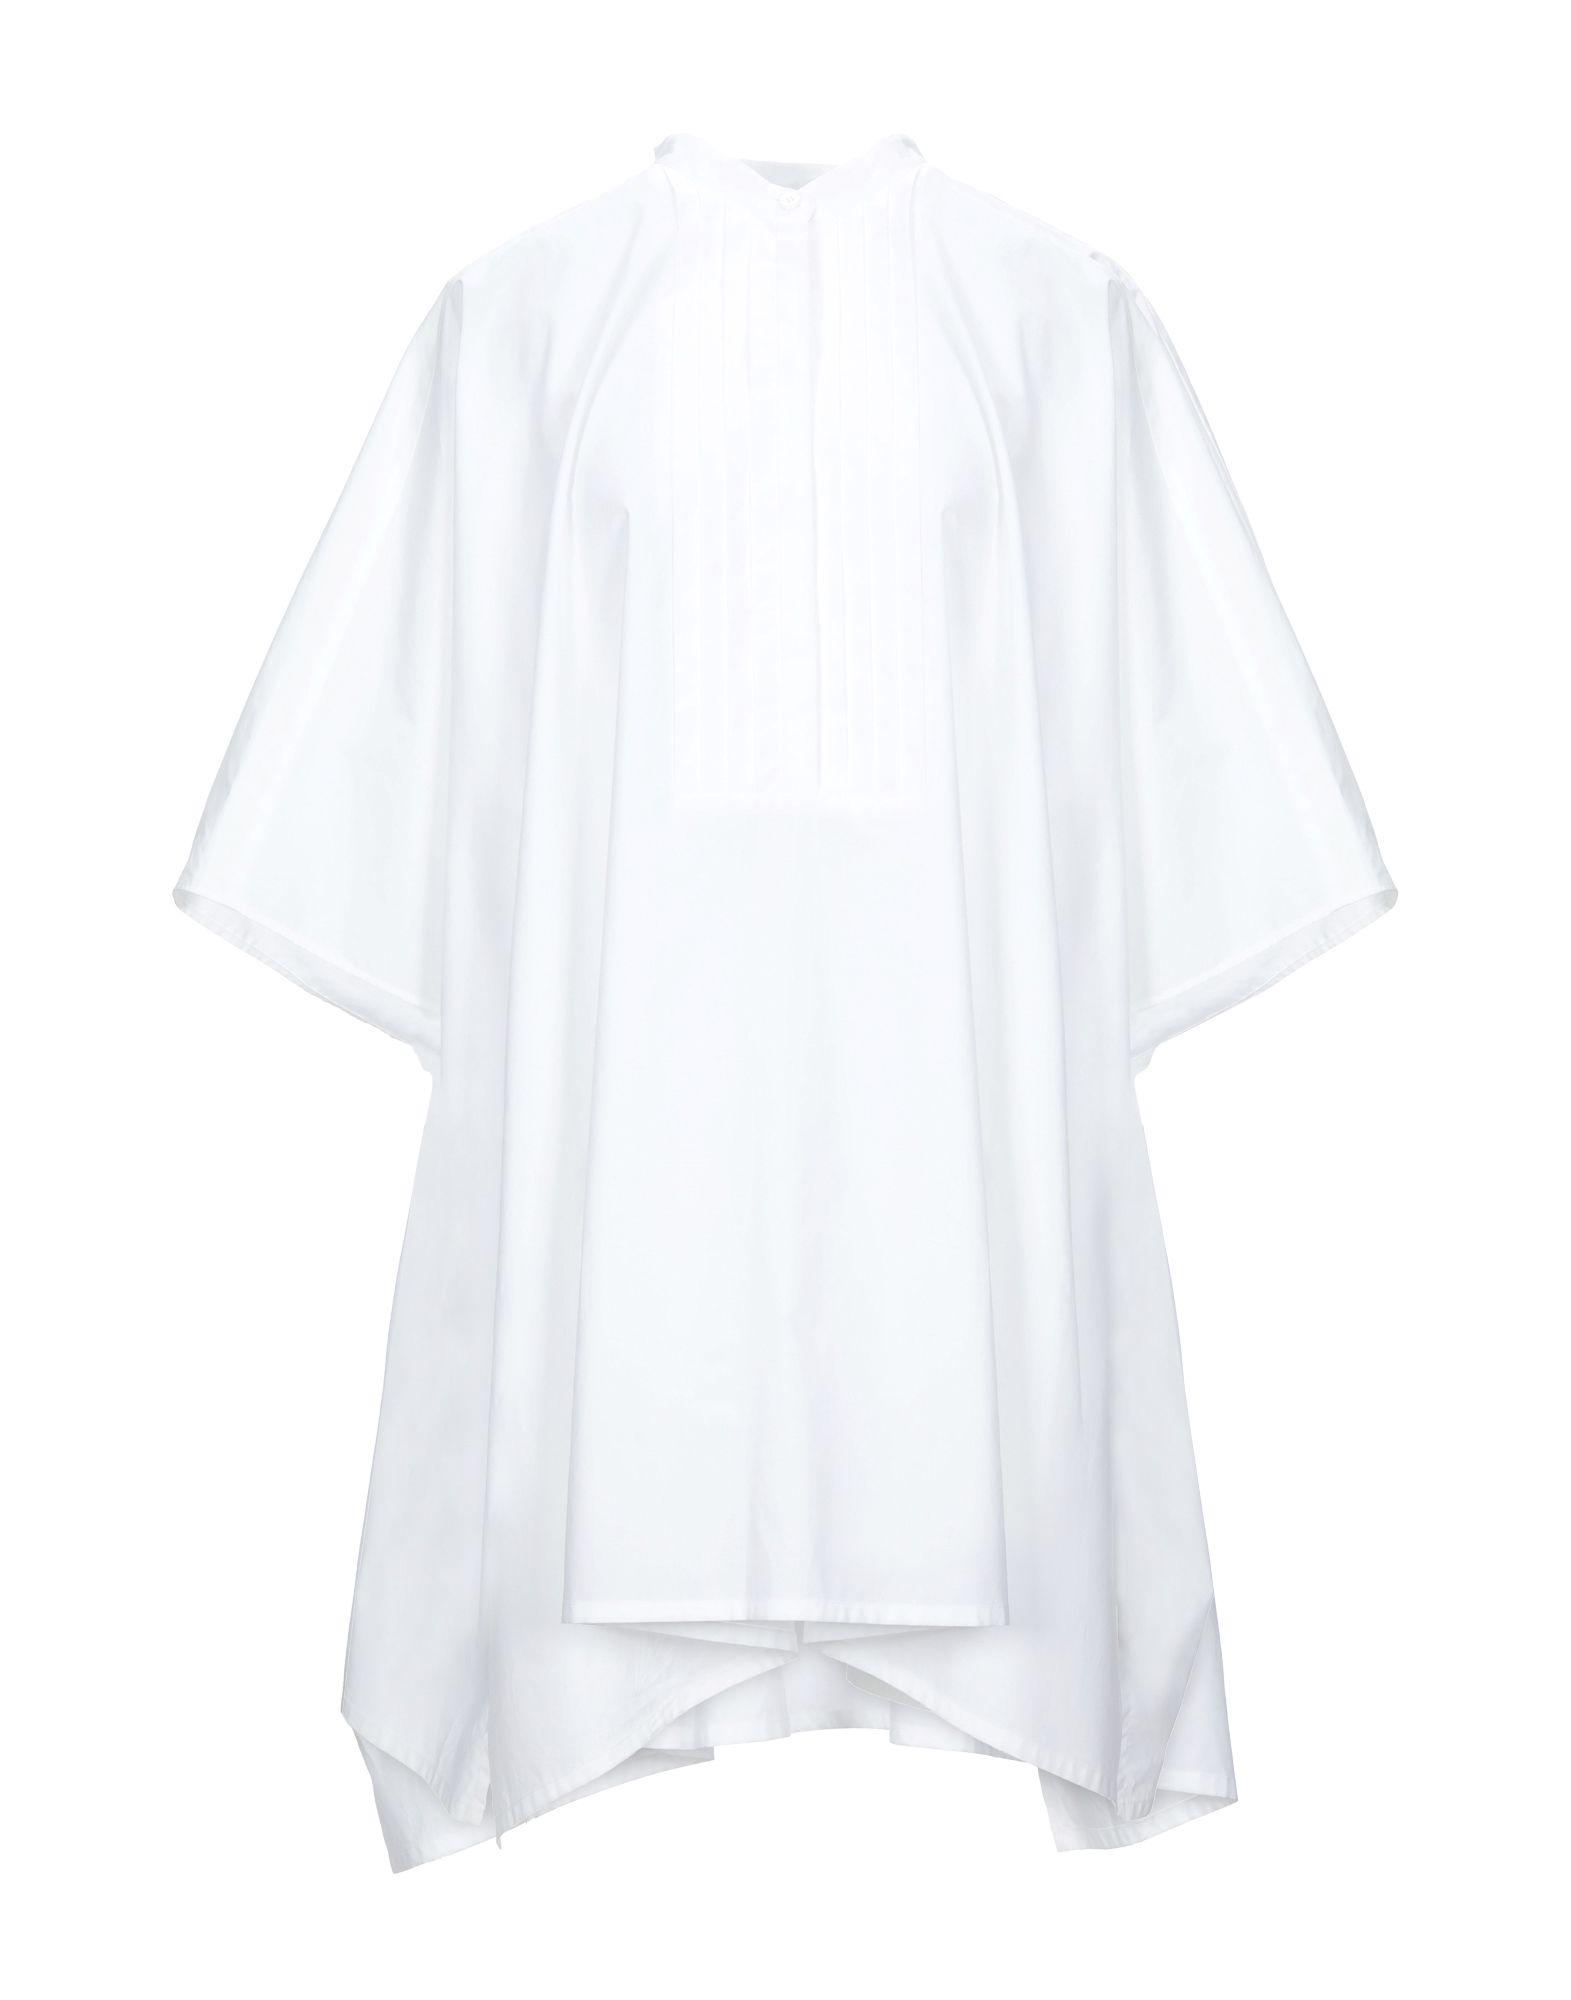 MM6 MAISON MARGIELA Kaftans. plain weave, solid color, 3/4 length sleeves, mandarin collar, unlined, folds, no pockets. 100% Cotton